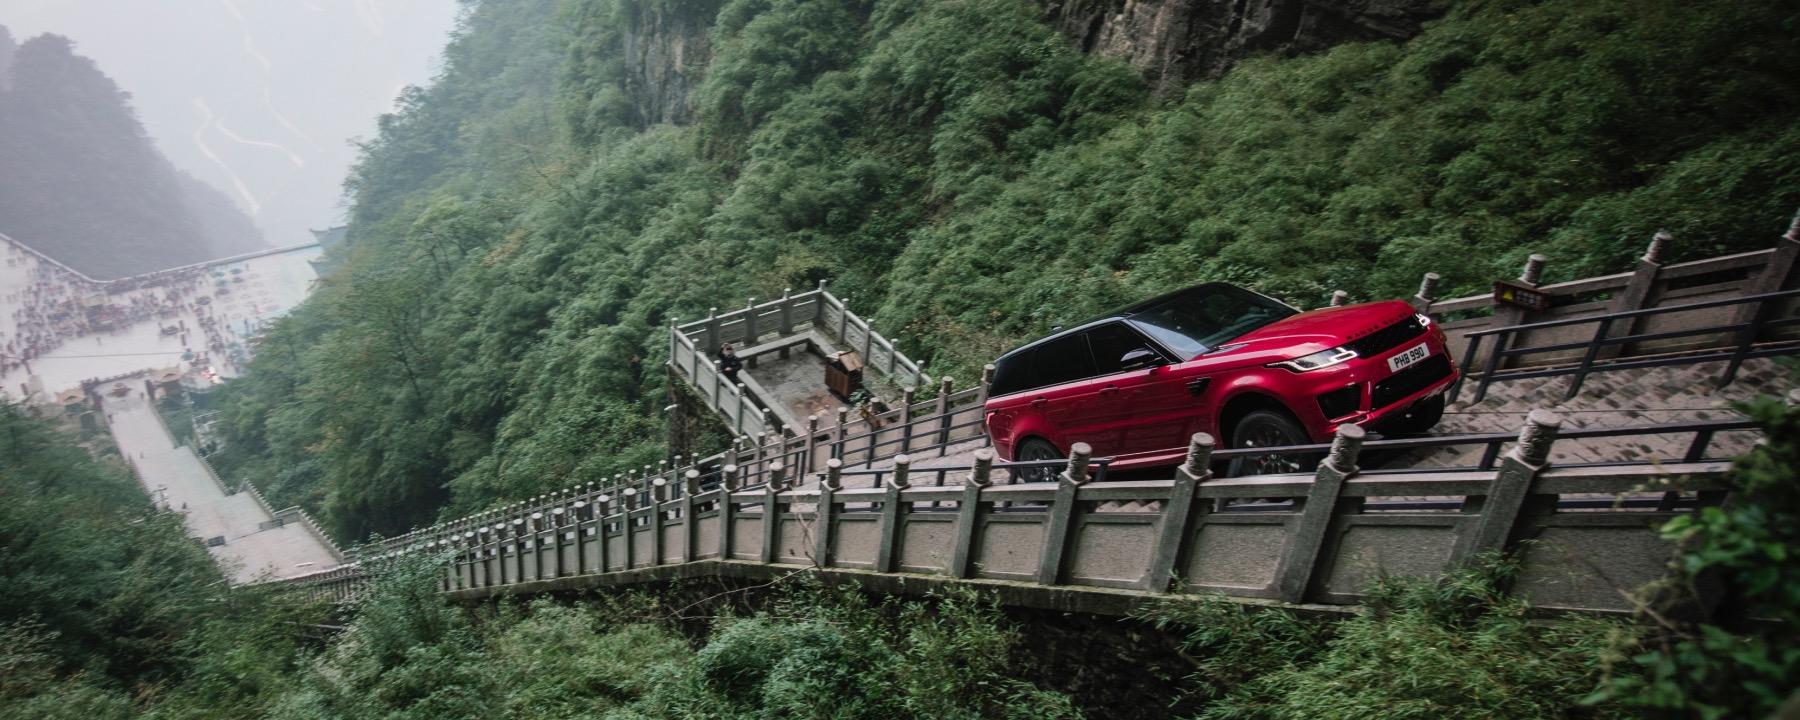 Land Rover Houston North >> Land Rover Climbs Heaven's Gate - indiGO Auto Group Blog